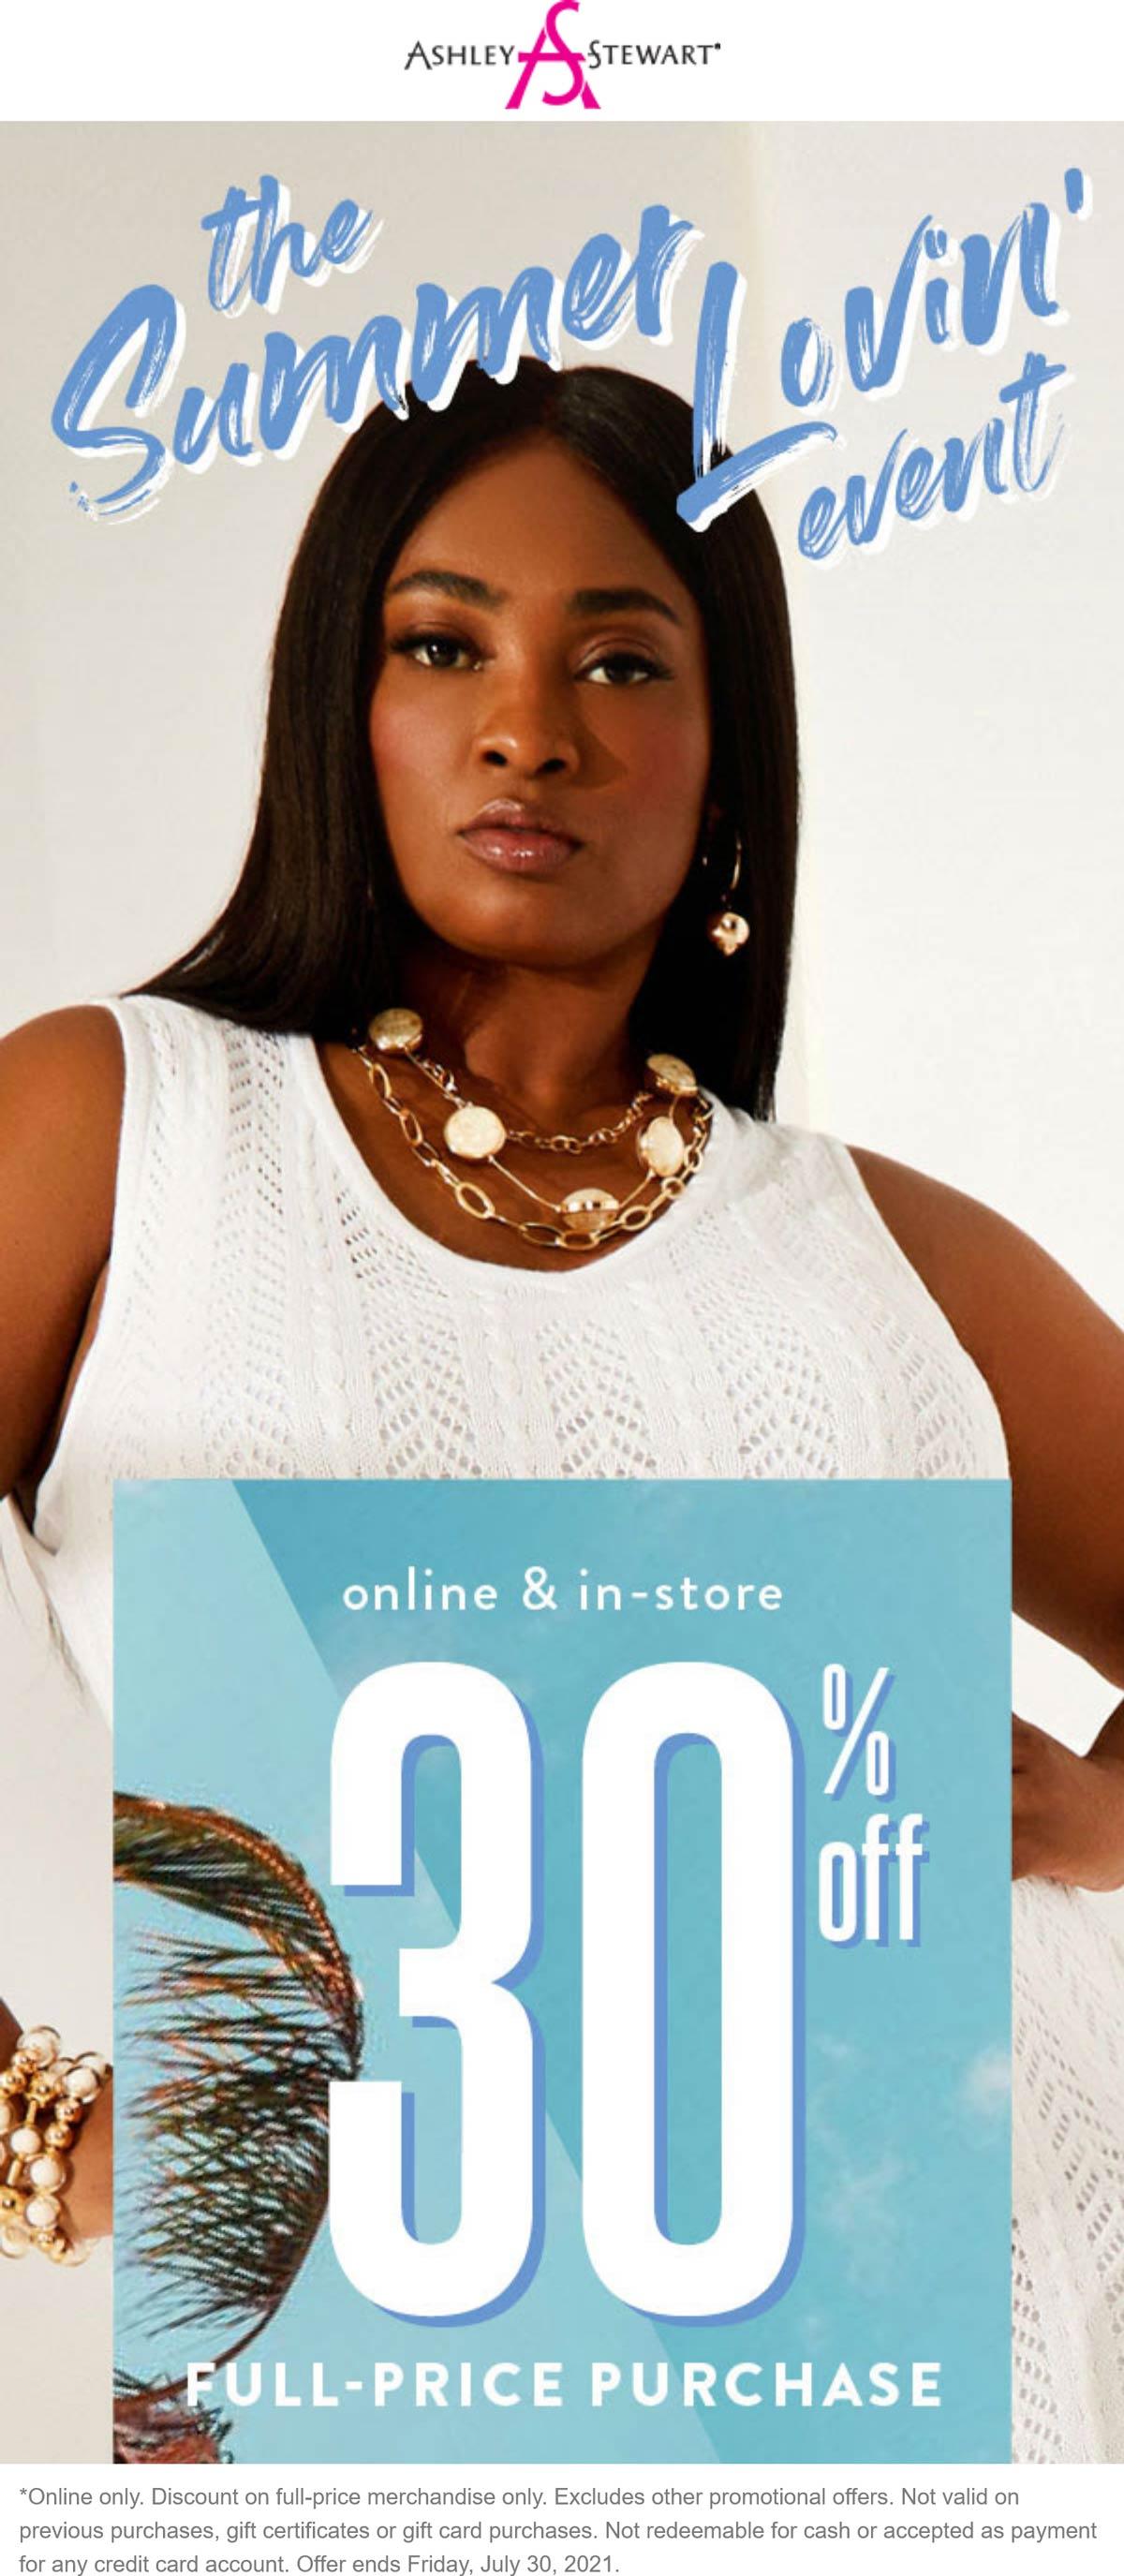 Ashley Stewart stores Coupon  30% off today at Ashley Stewart, ditto online #ashleystewart